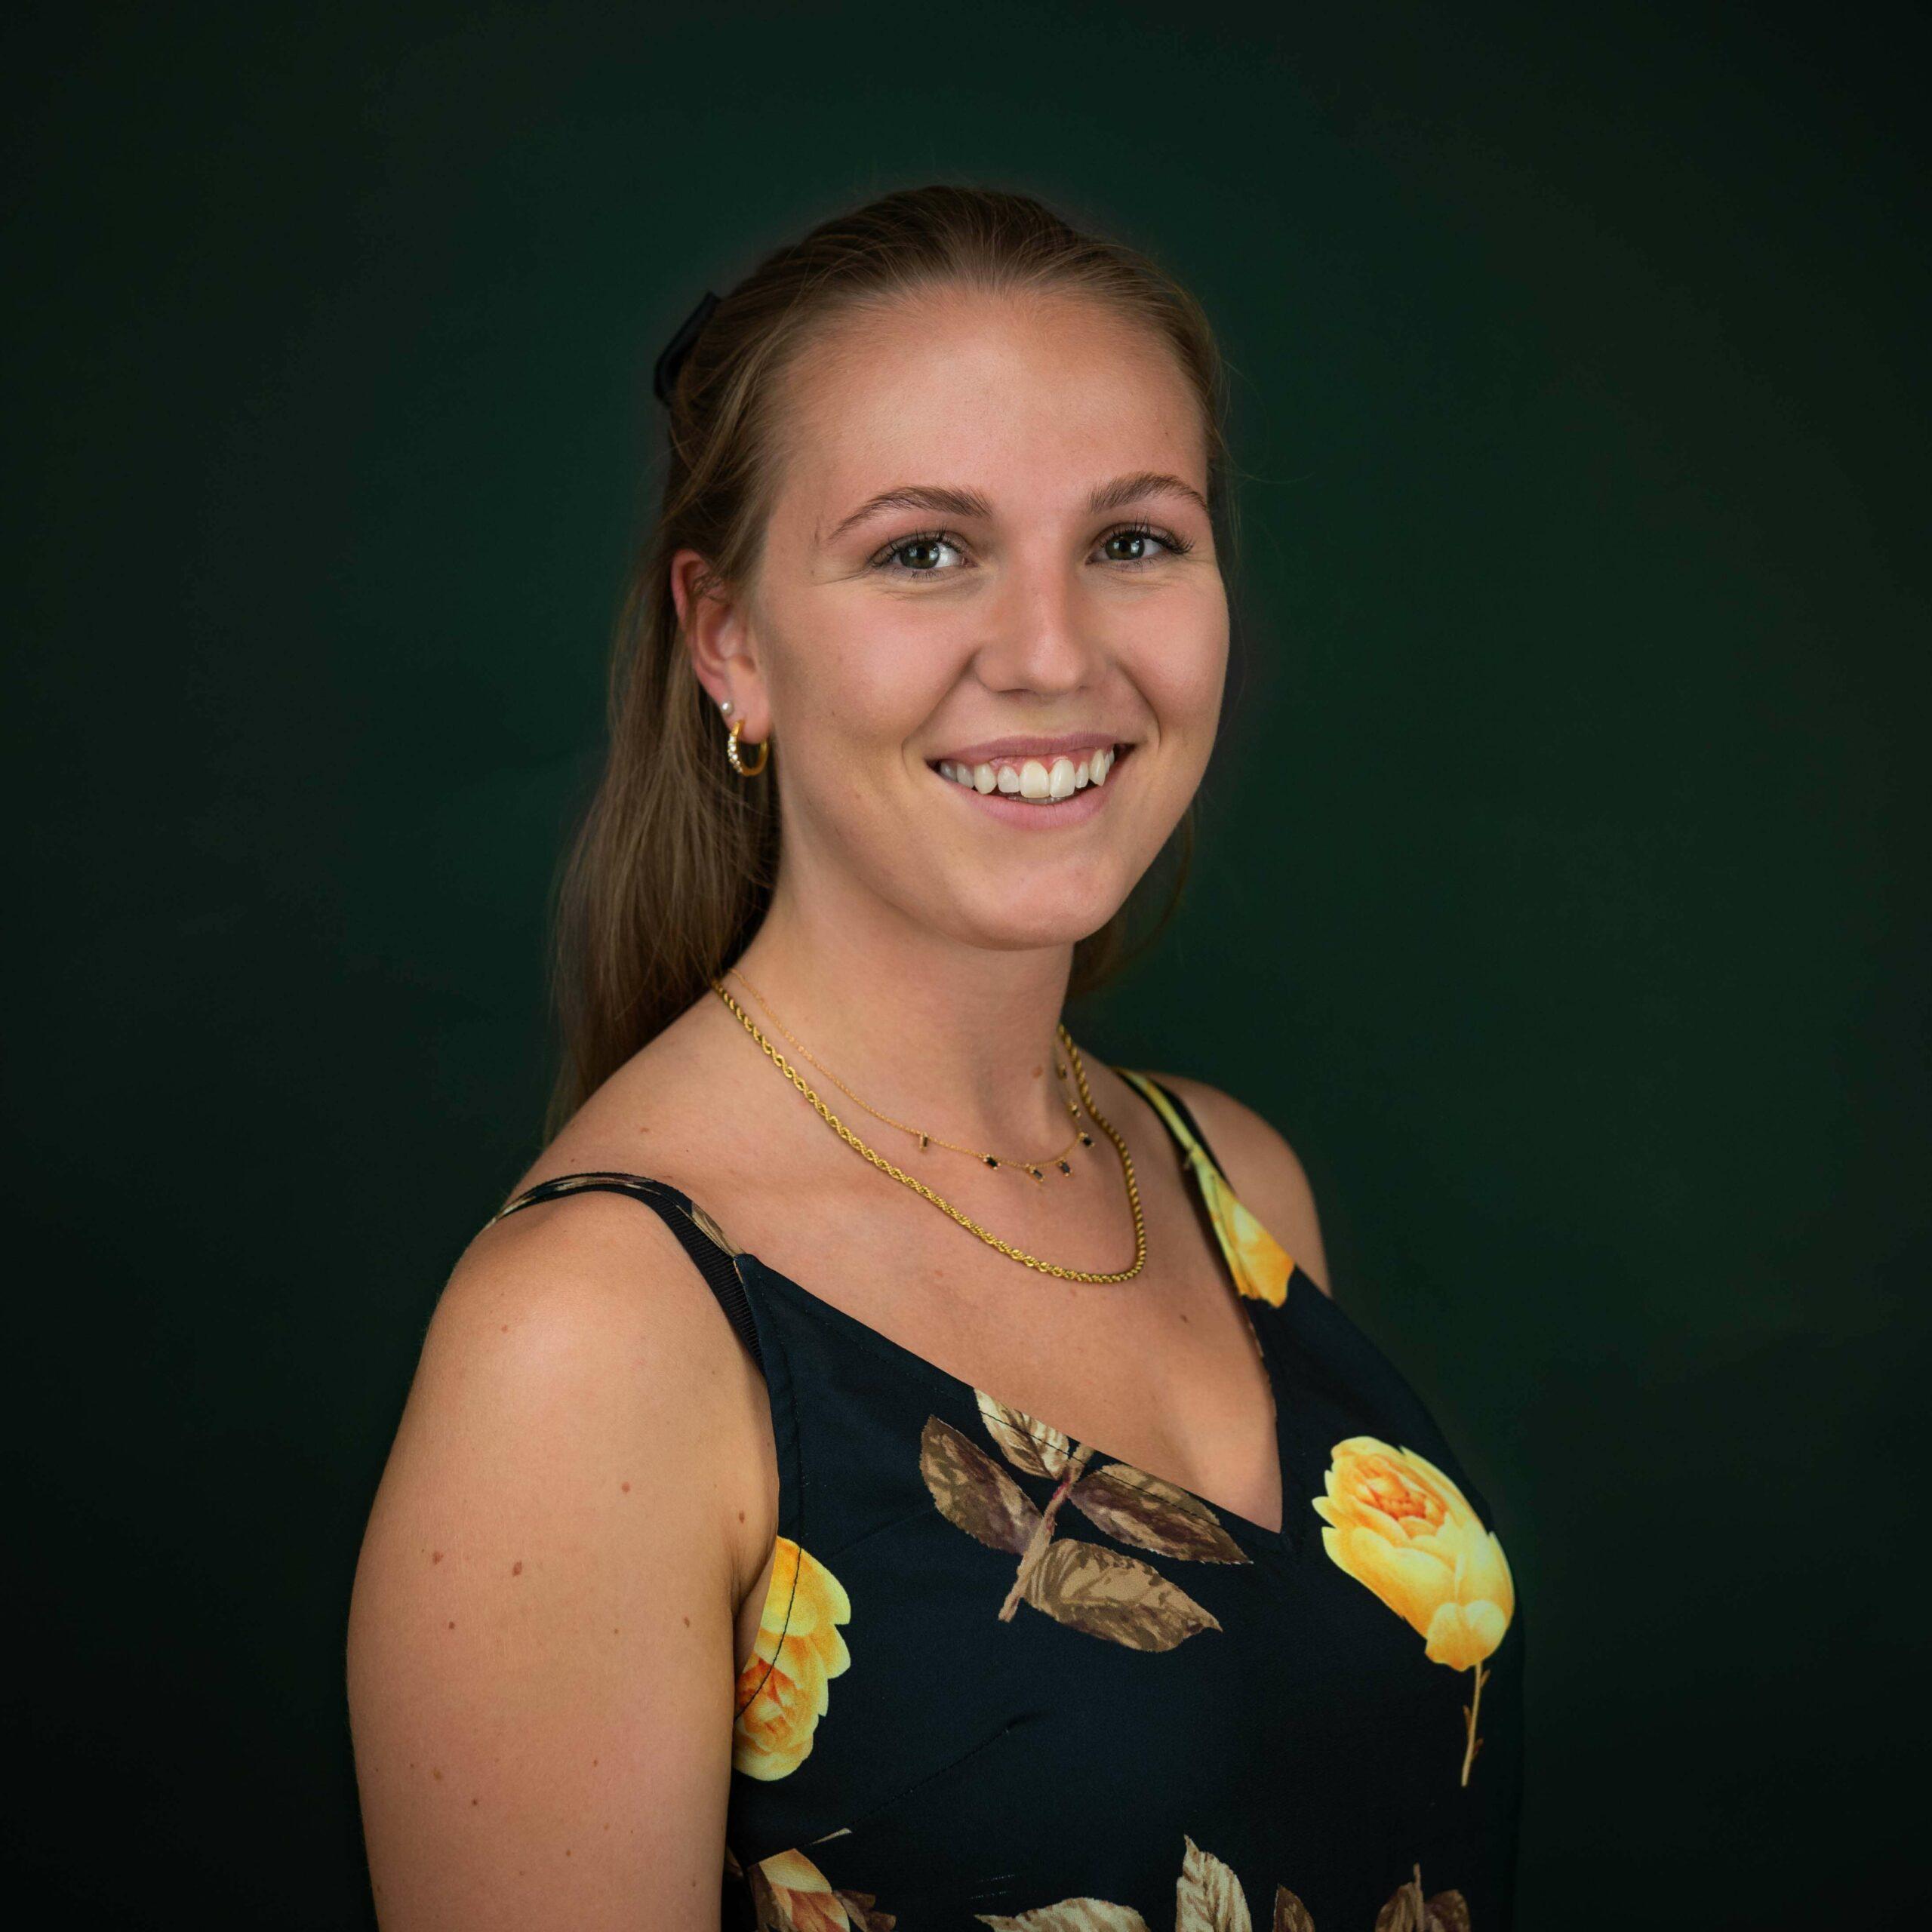 Laura Holte Nielsen